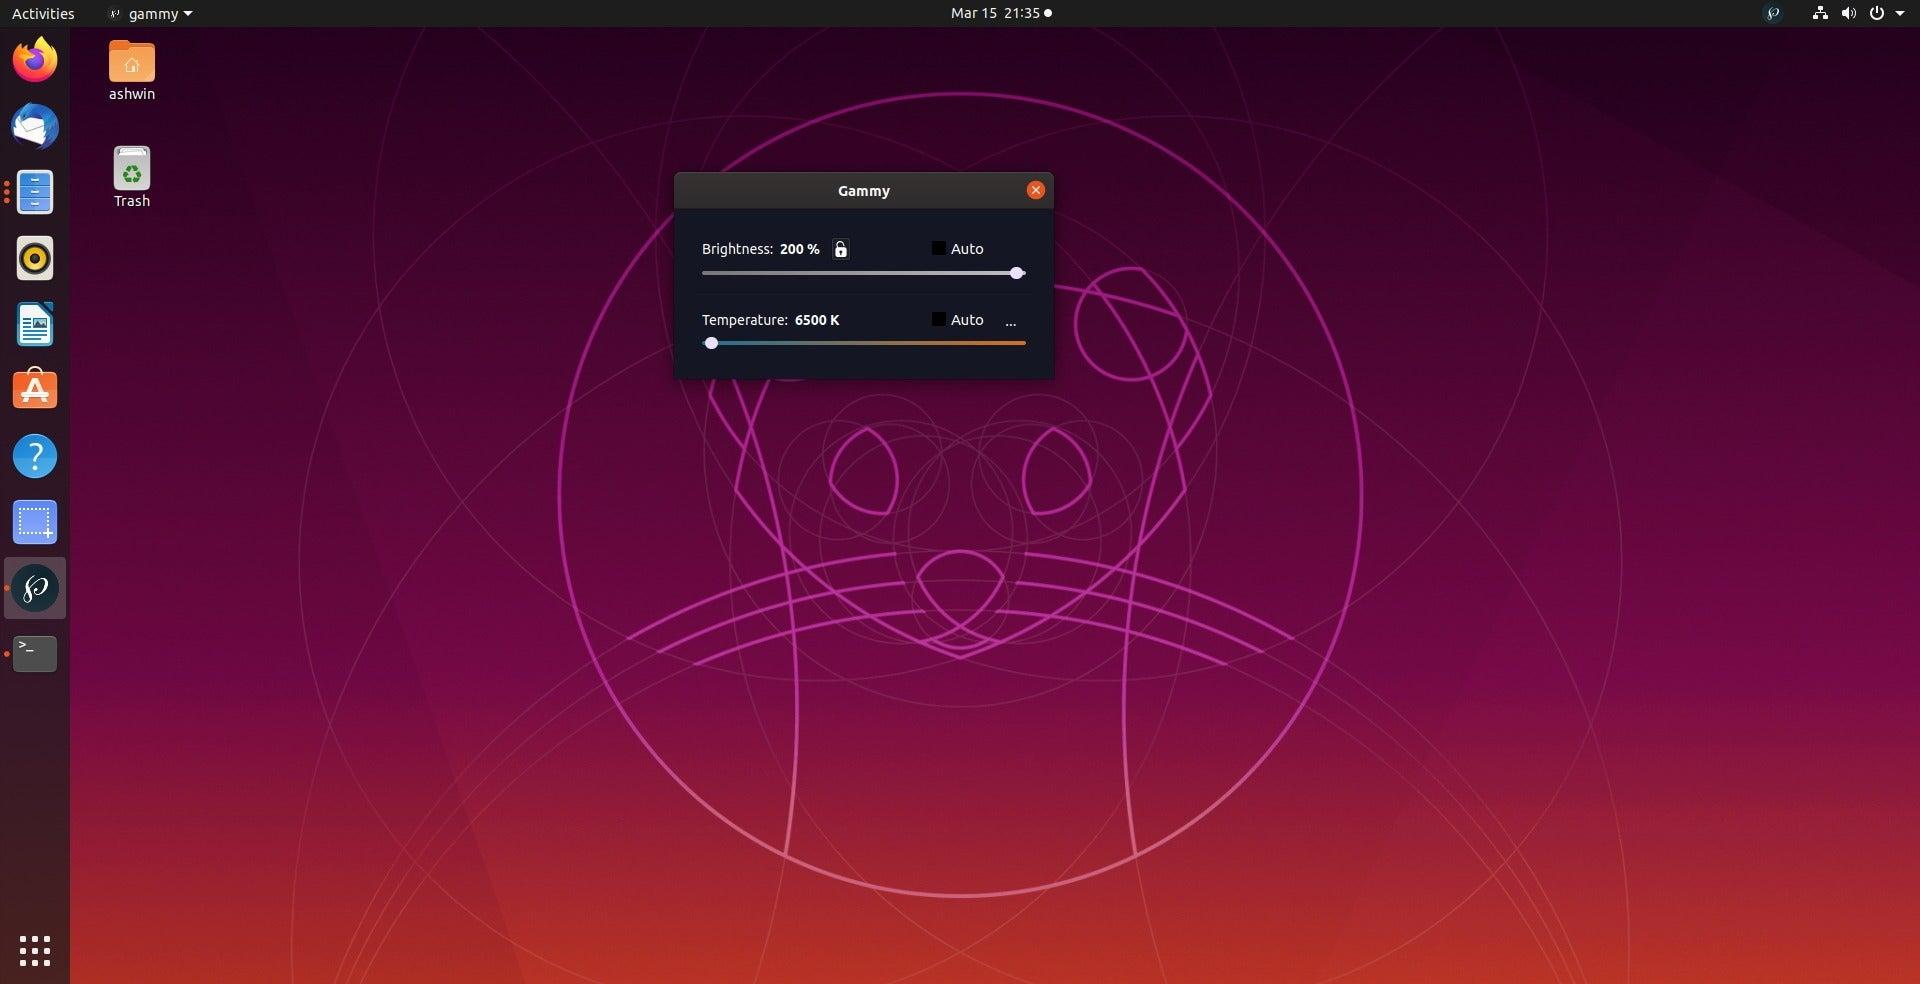 Gammy Linux 200 por ciento